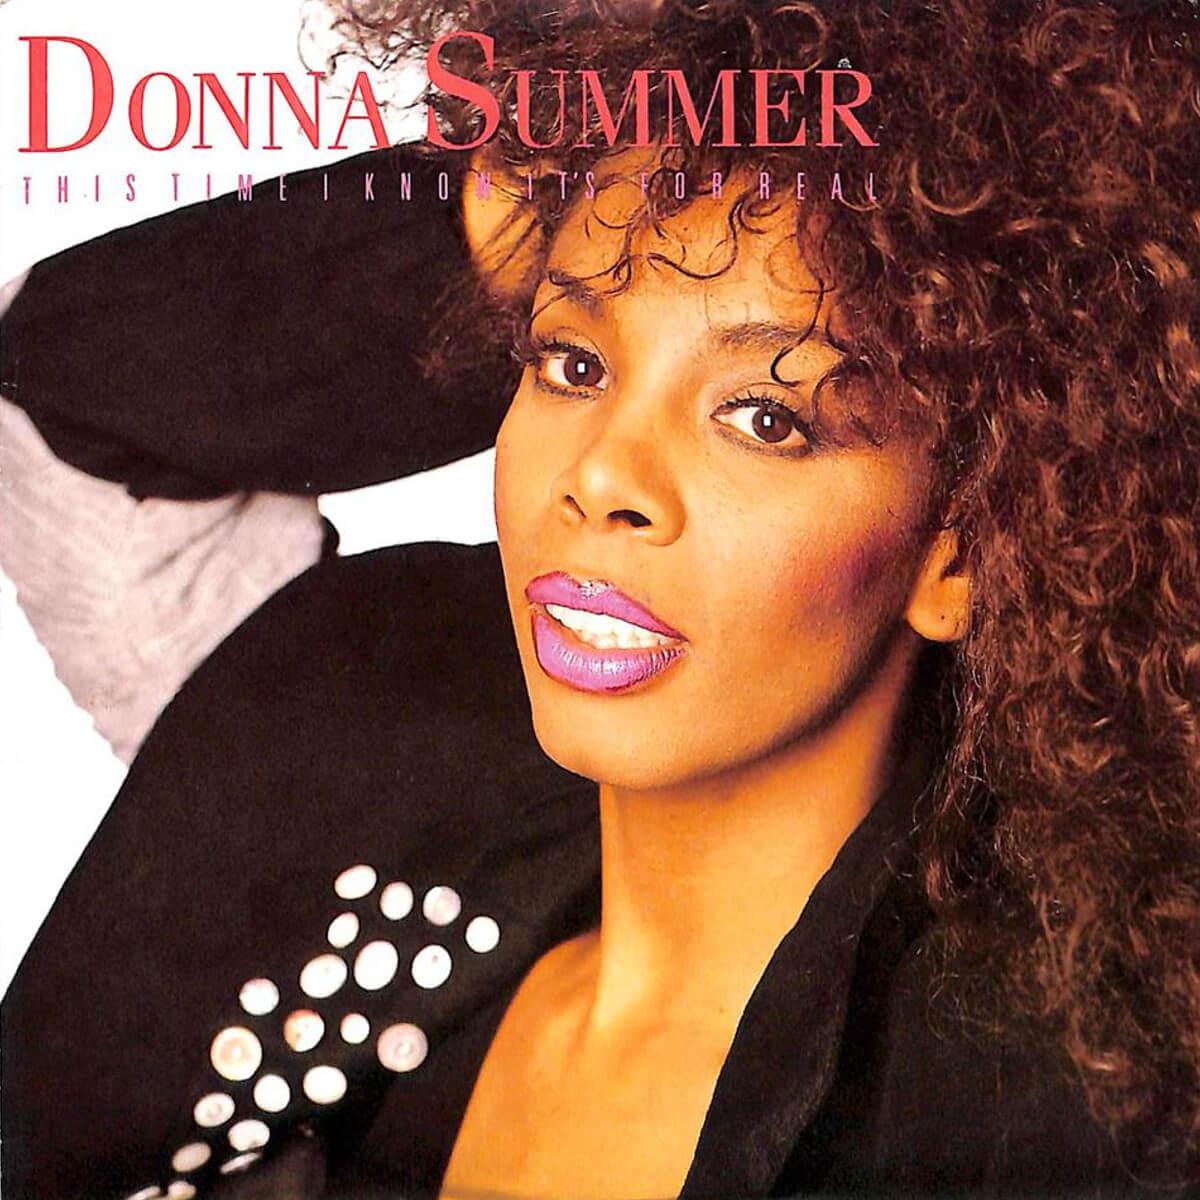 Disco Music Art Donna Summer Esta vez es saber que es real